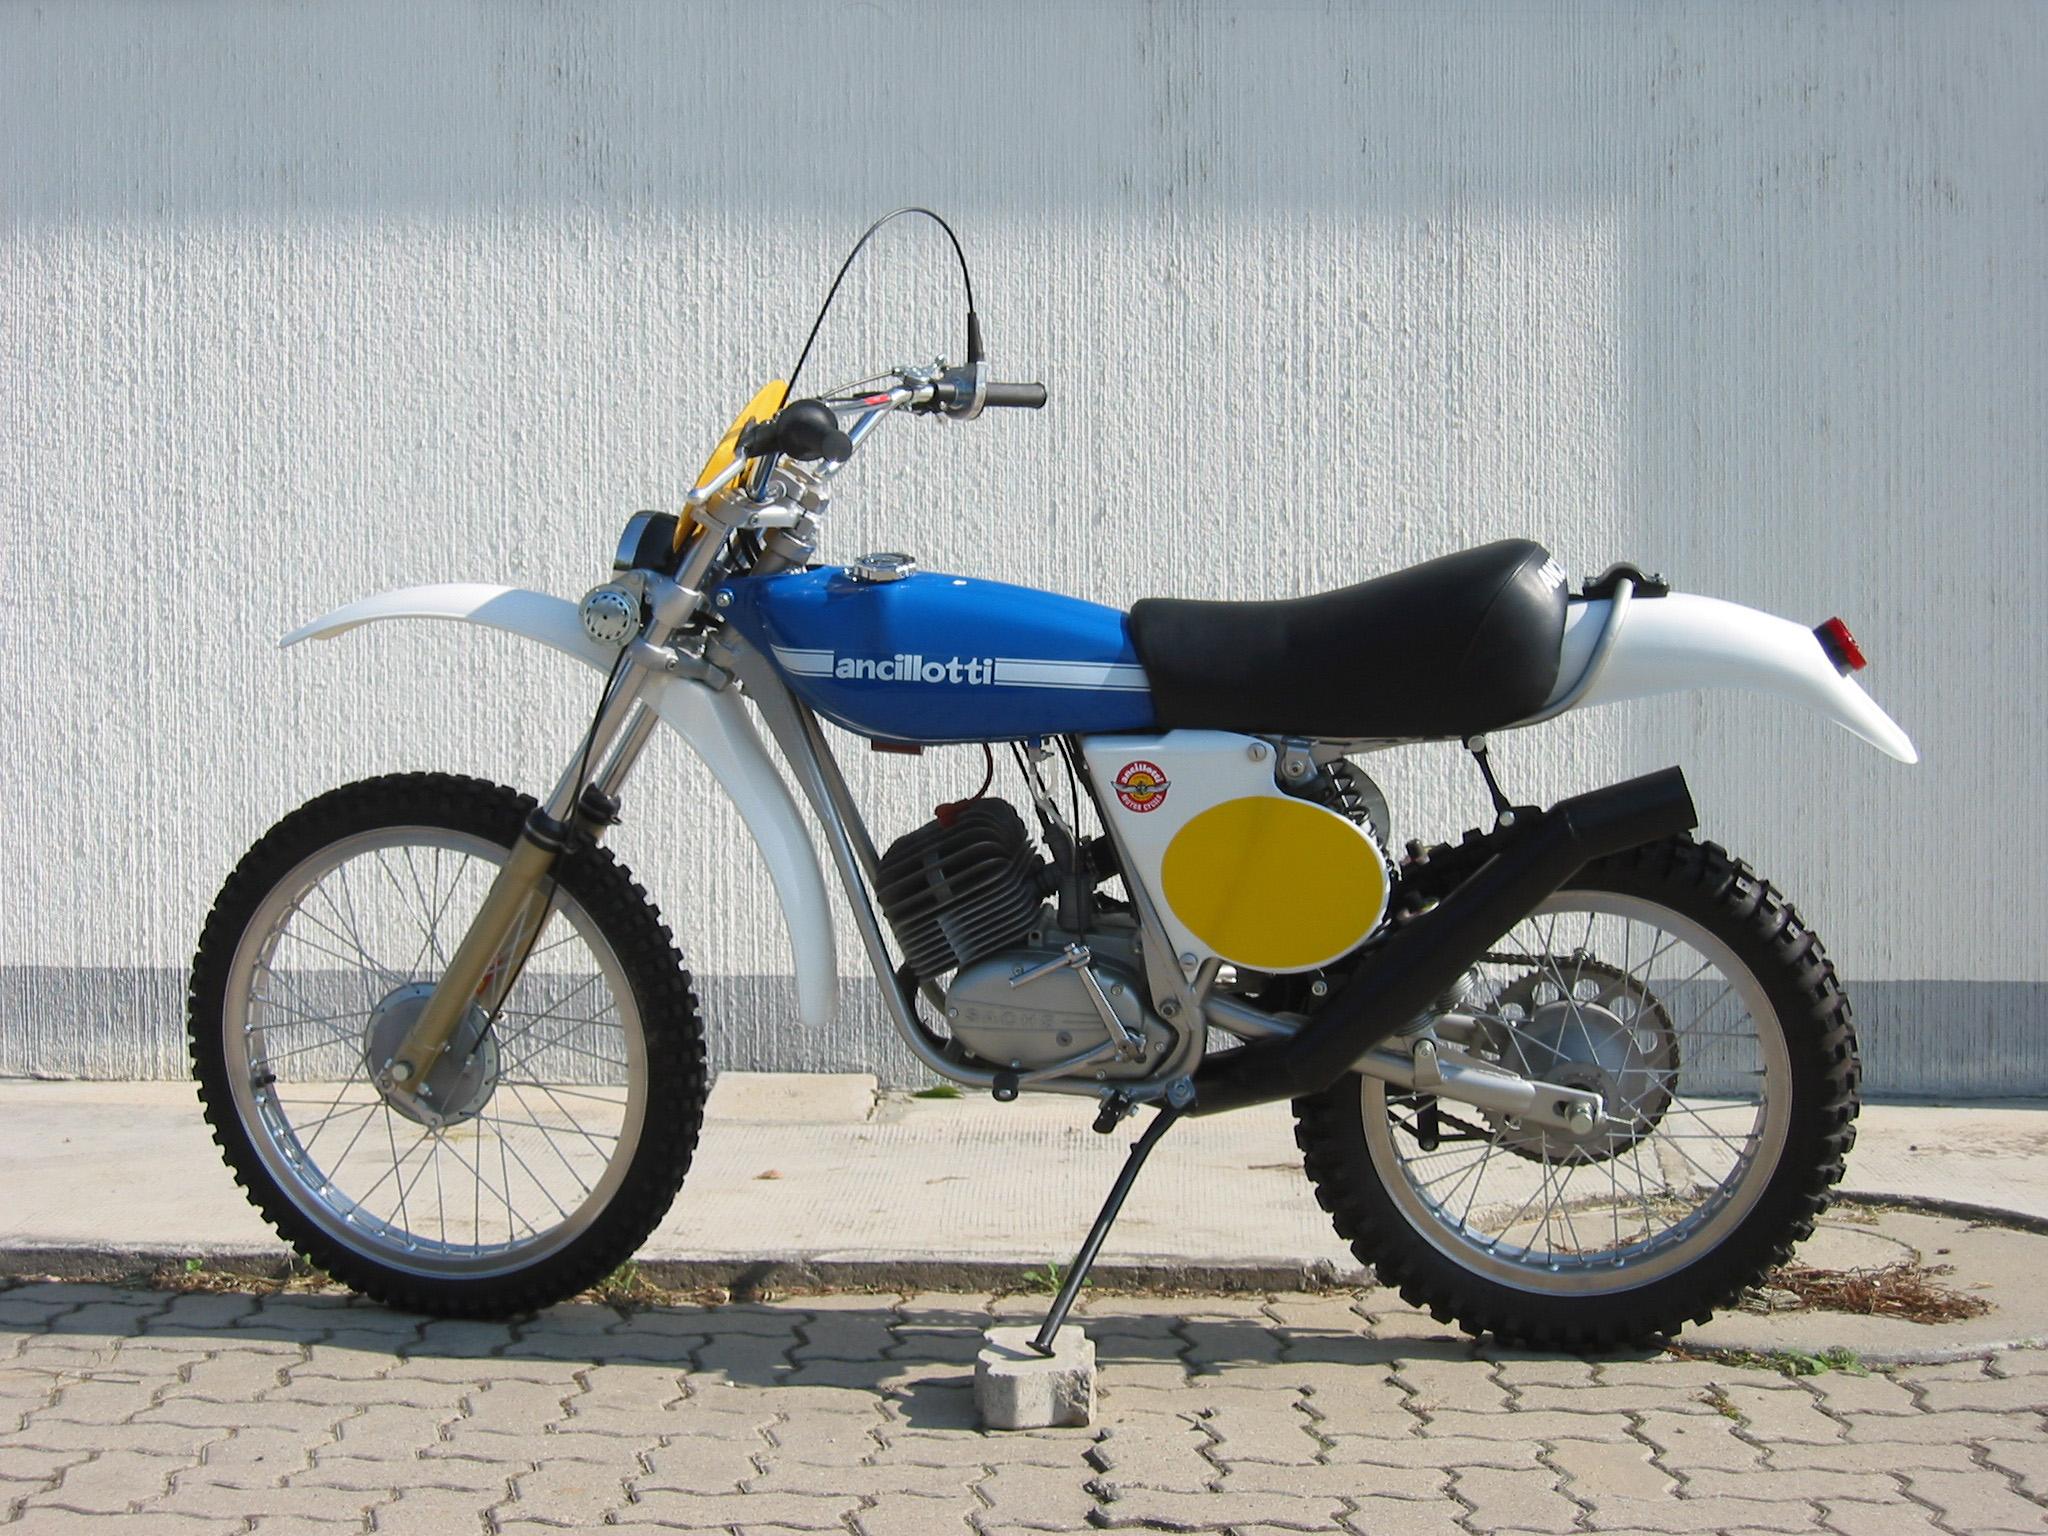 ancillotti scarab 50 1975